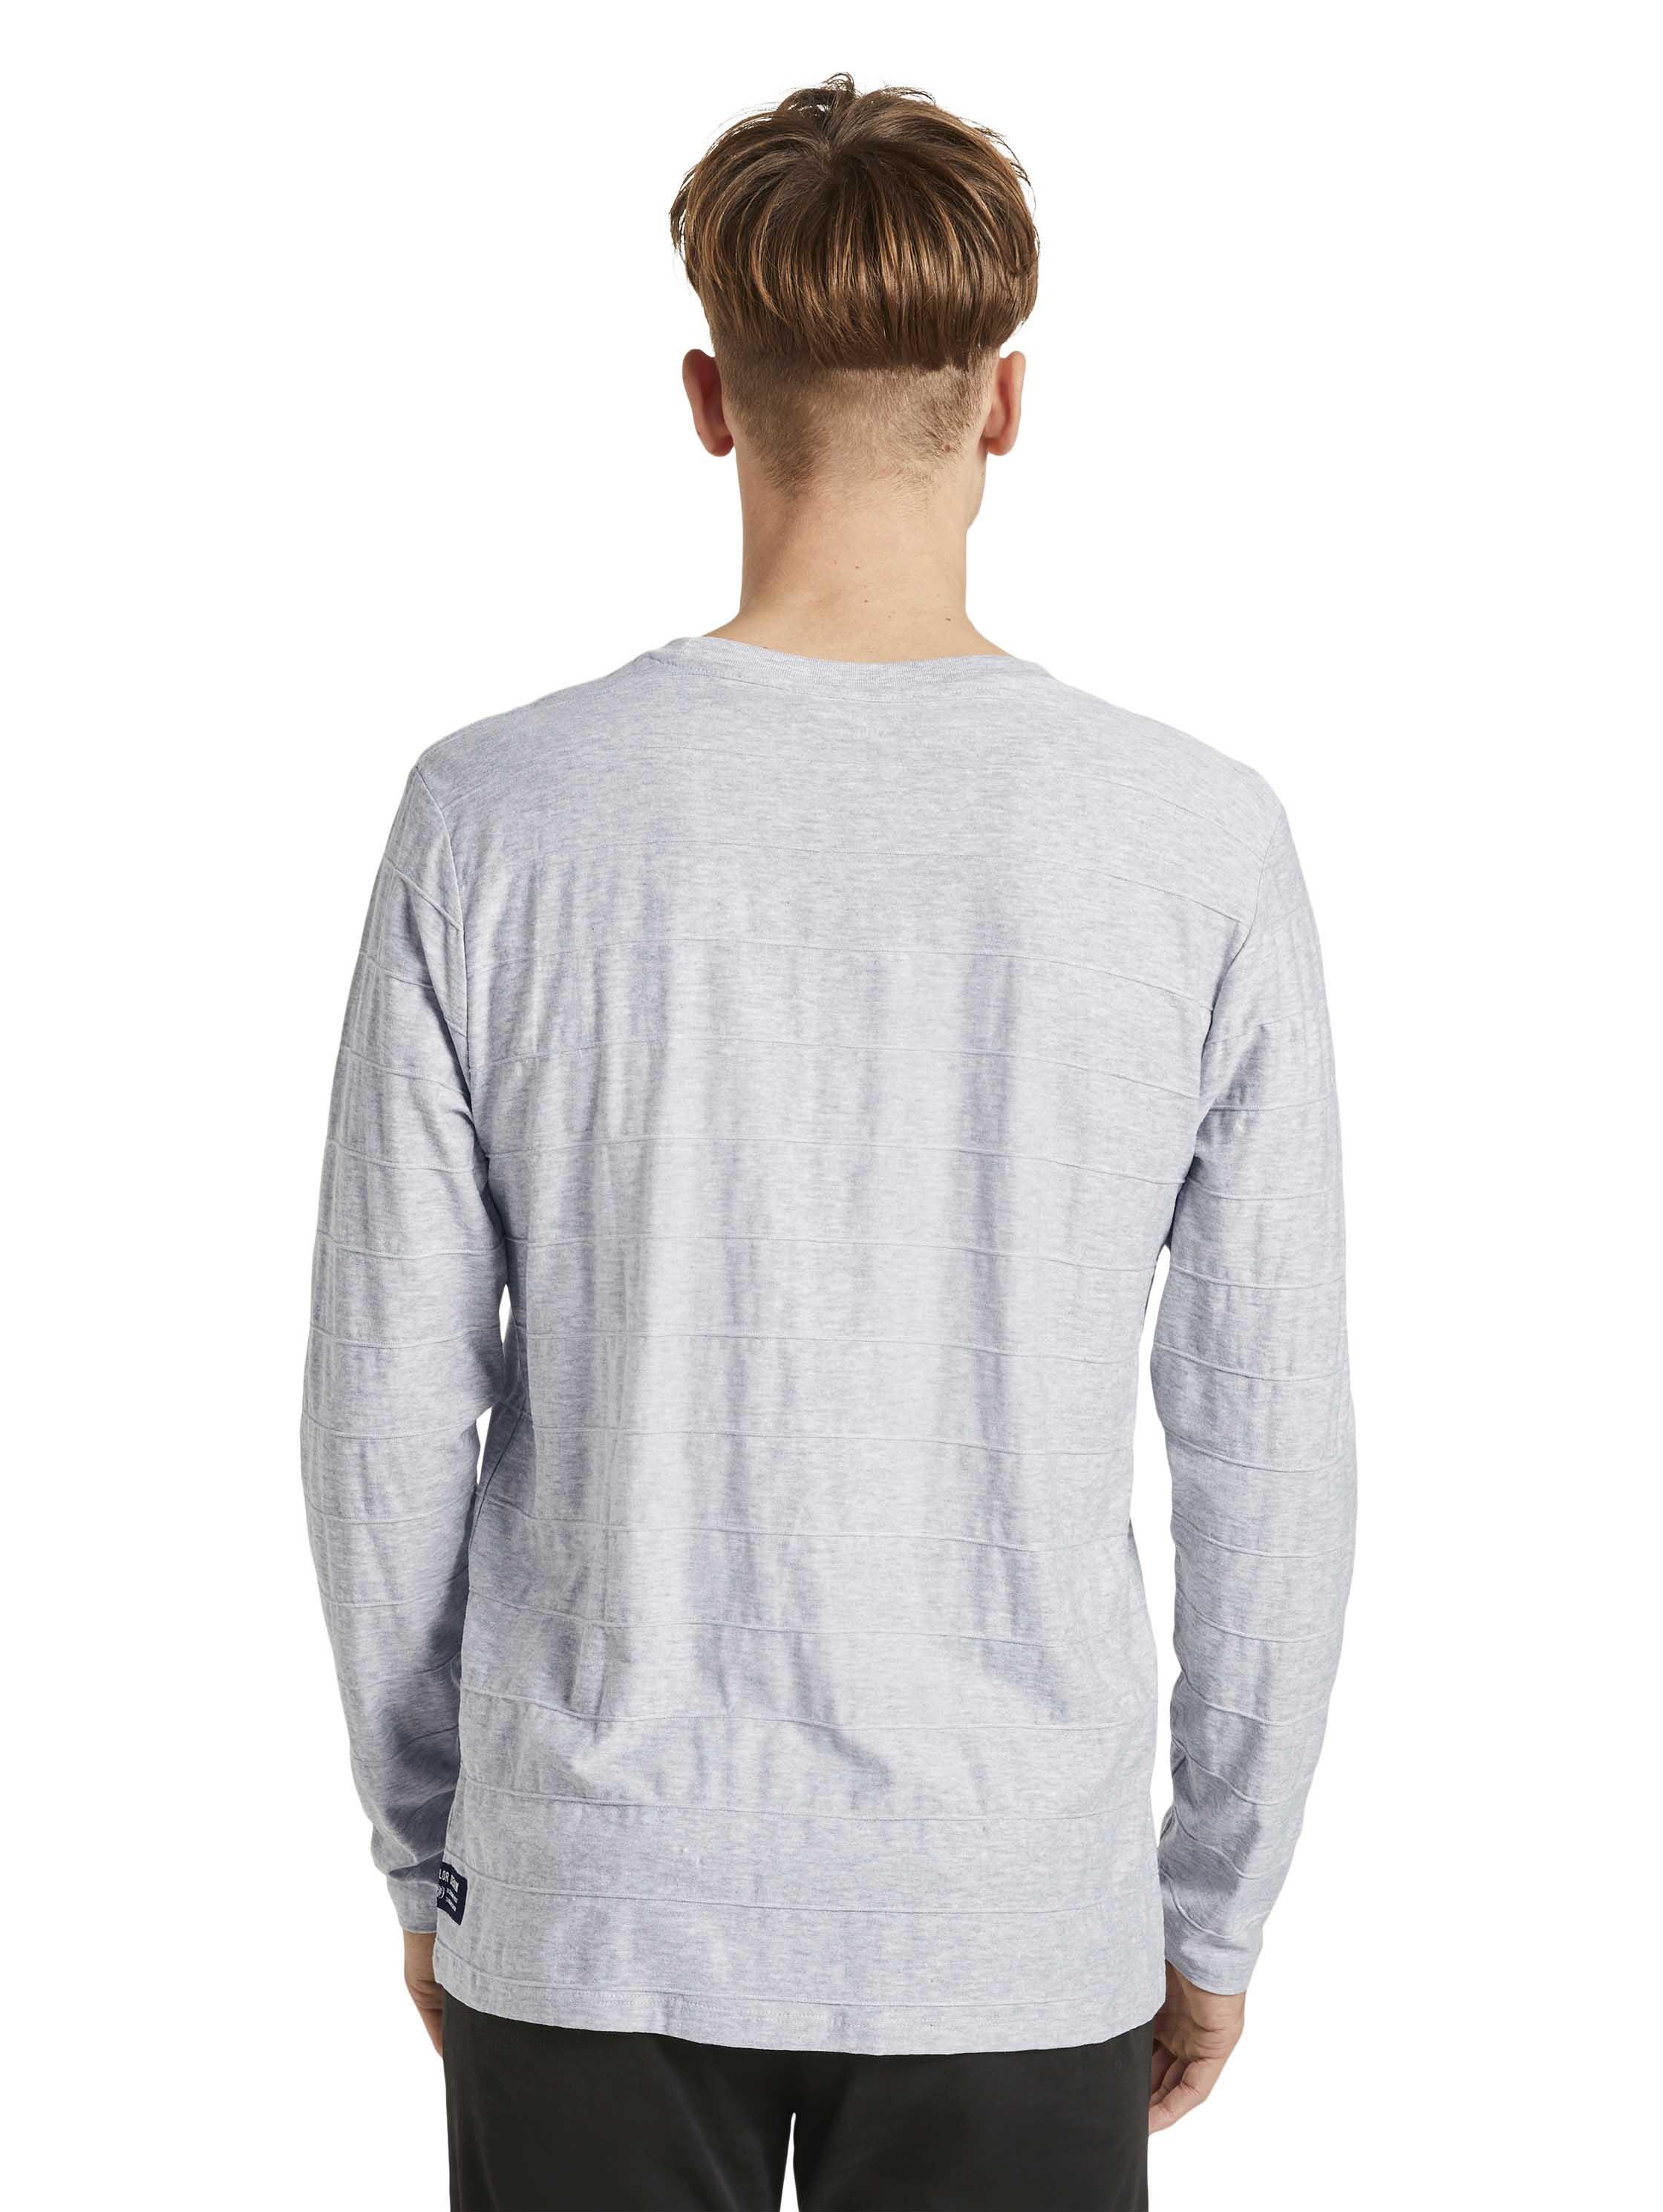 Tom Tailor Denim Shirt New Structure